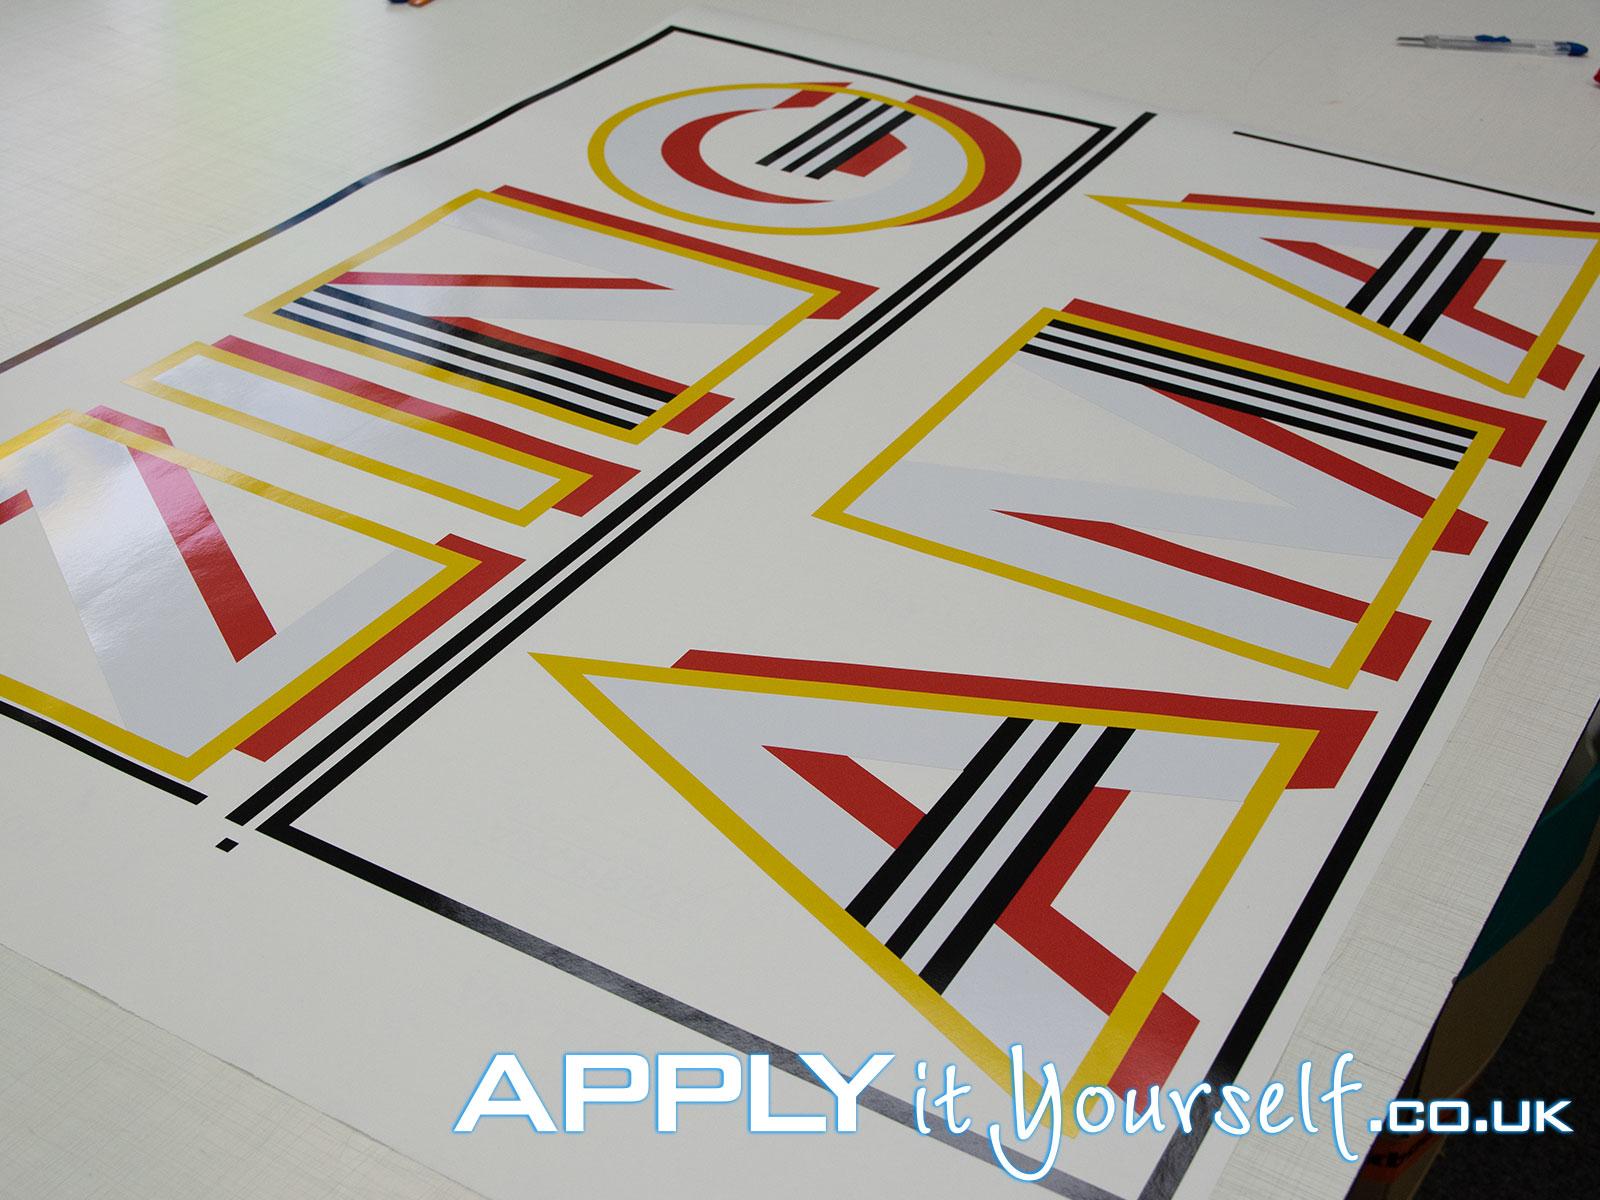 window sticker, corporate, name, logo, large, cut-to-shape